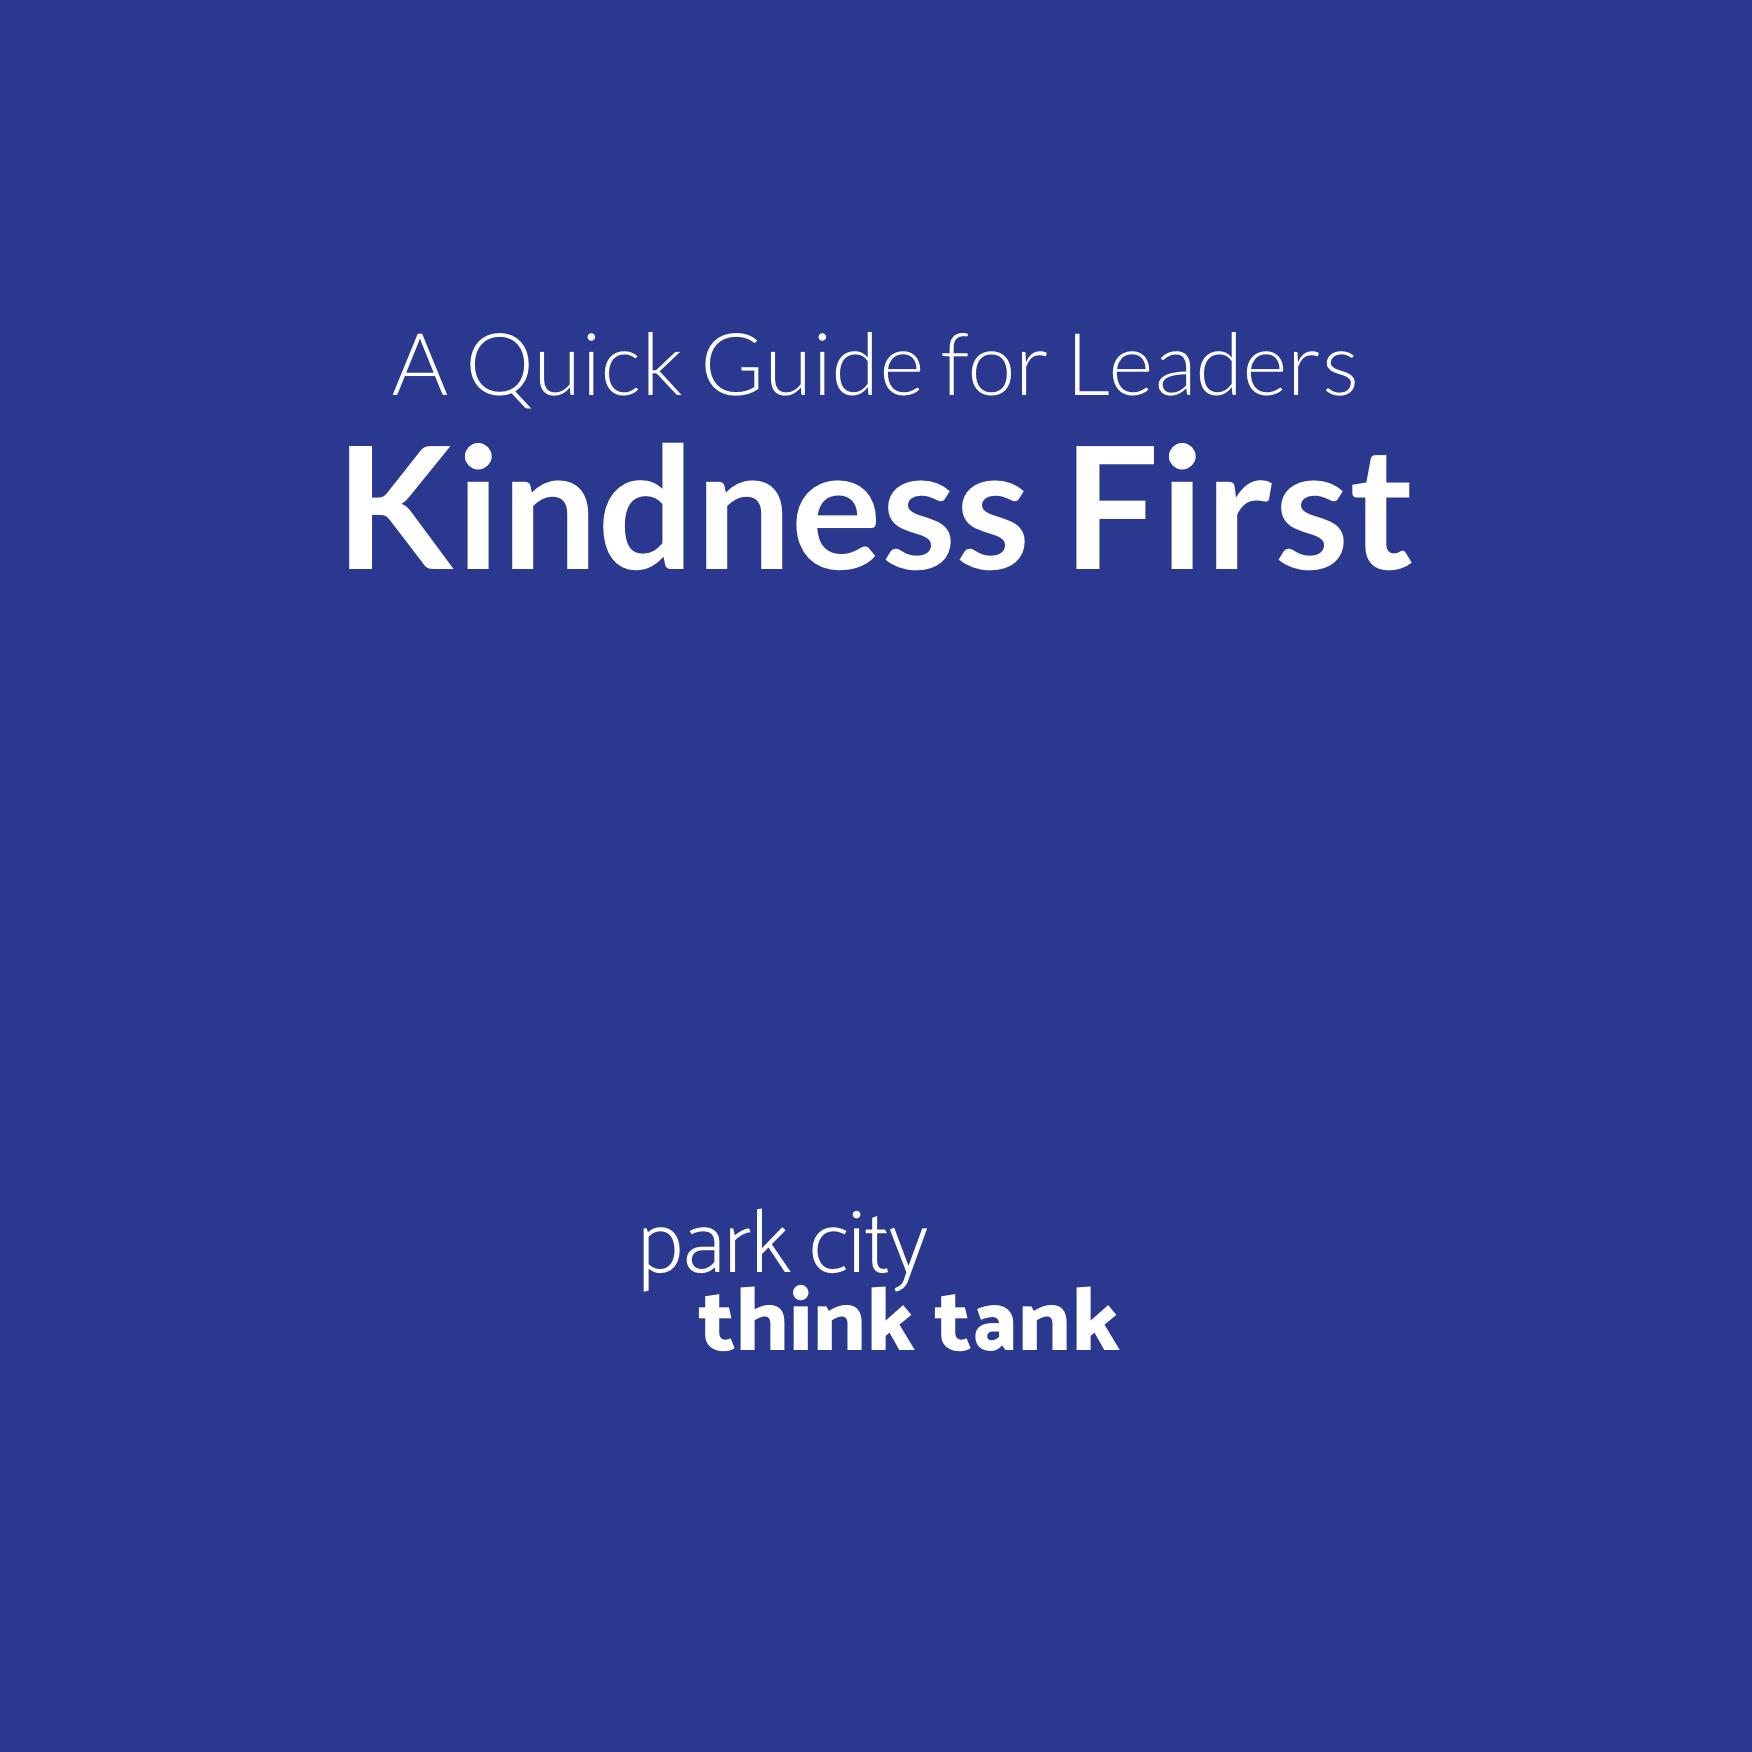 Kindness First-Park-City-Think-Tank.jpg